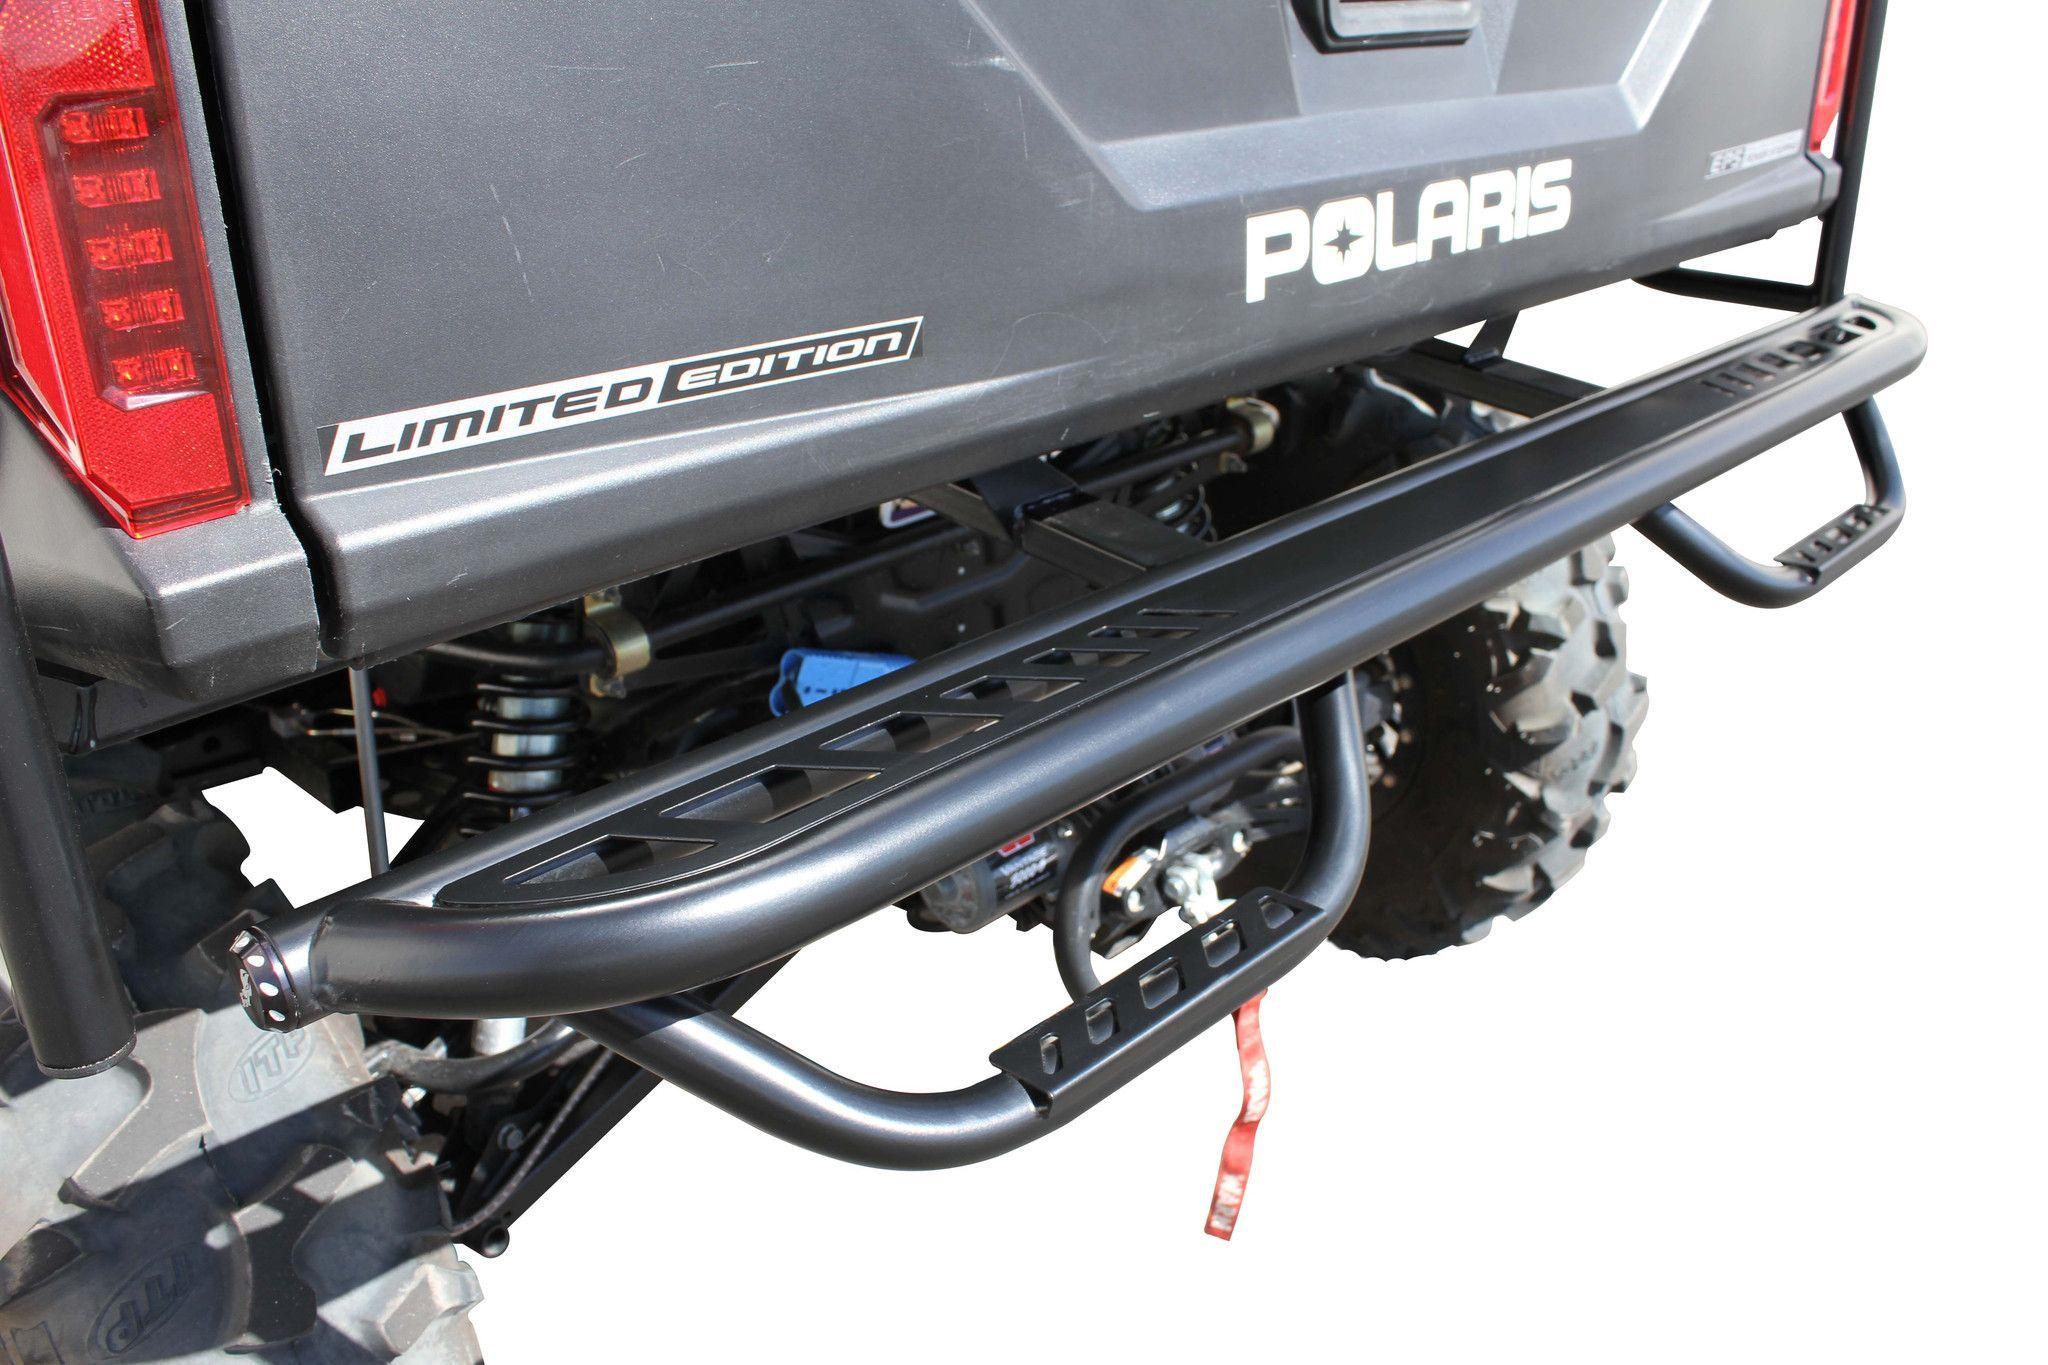 Readyforce Stepup Rear Bumper For Full Size Ranger And Crew With Images Polaris Ranger Ranger Polaris Ranger Crew